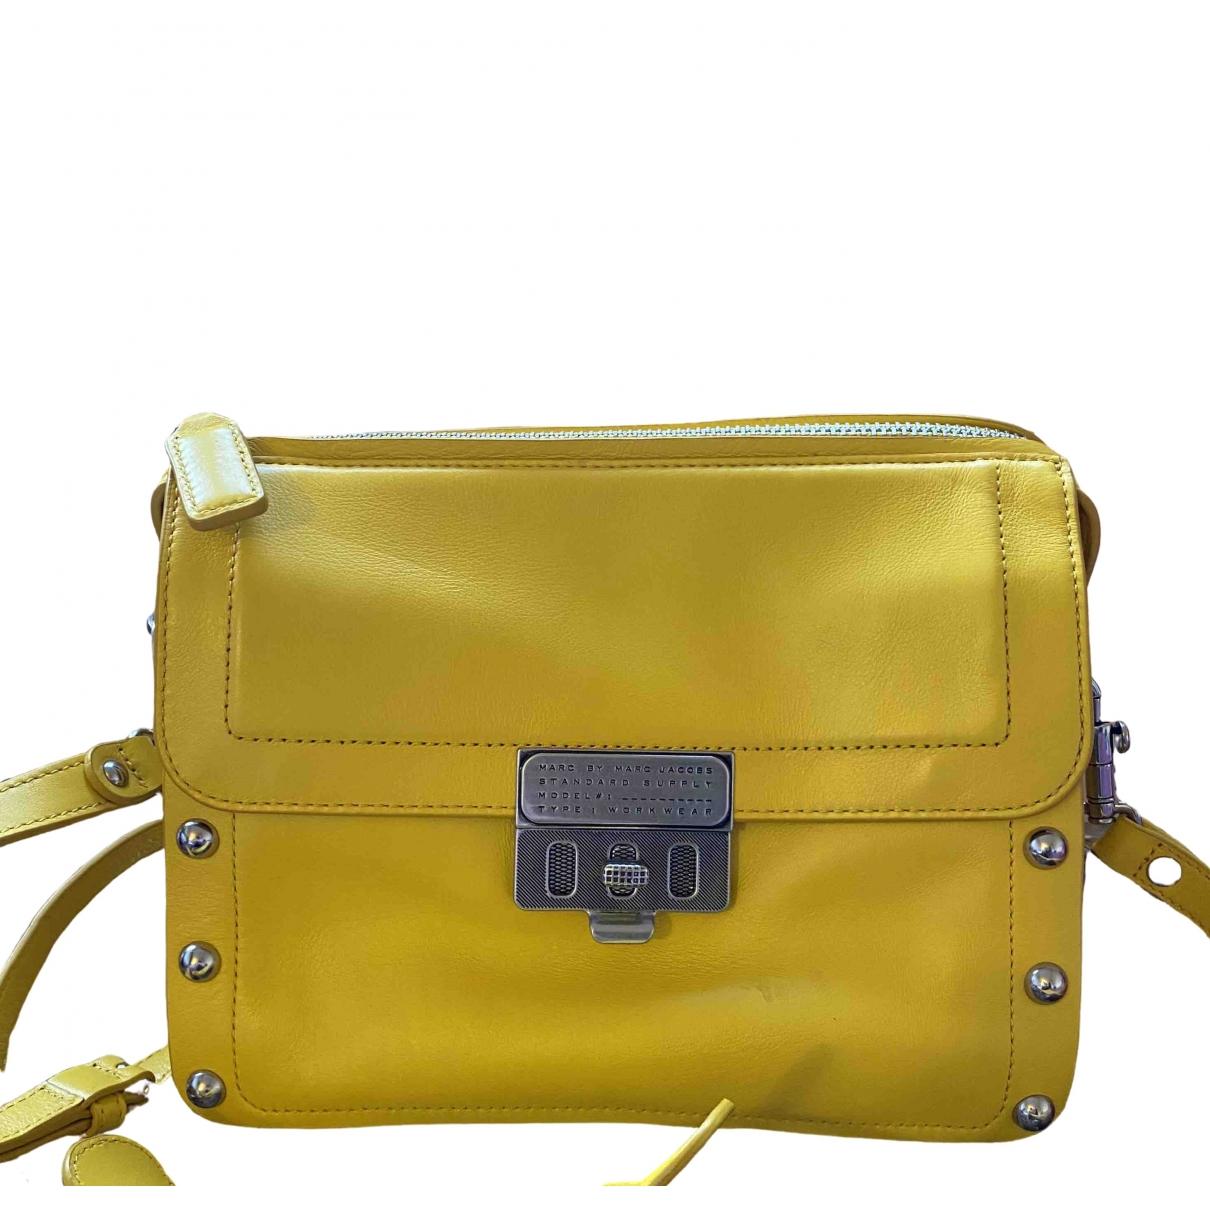 Marc By Marc Jacobs \N Handtasche in  Gelb Lackleder